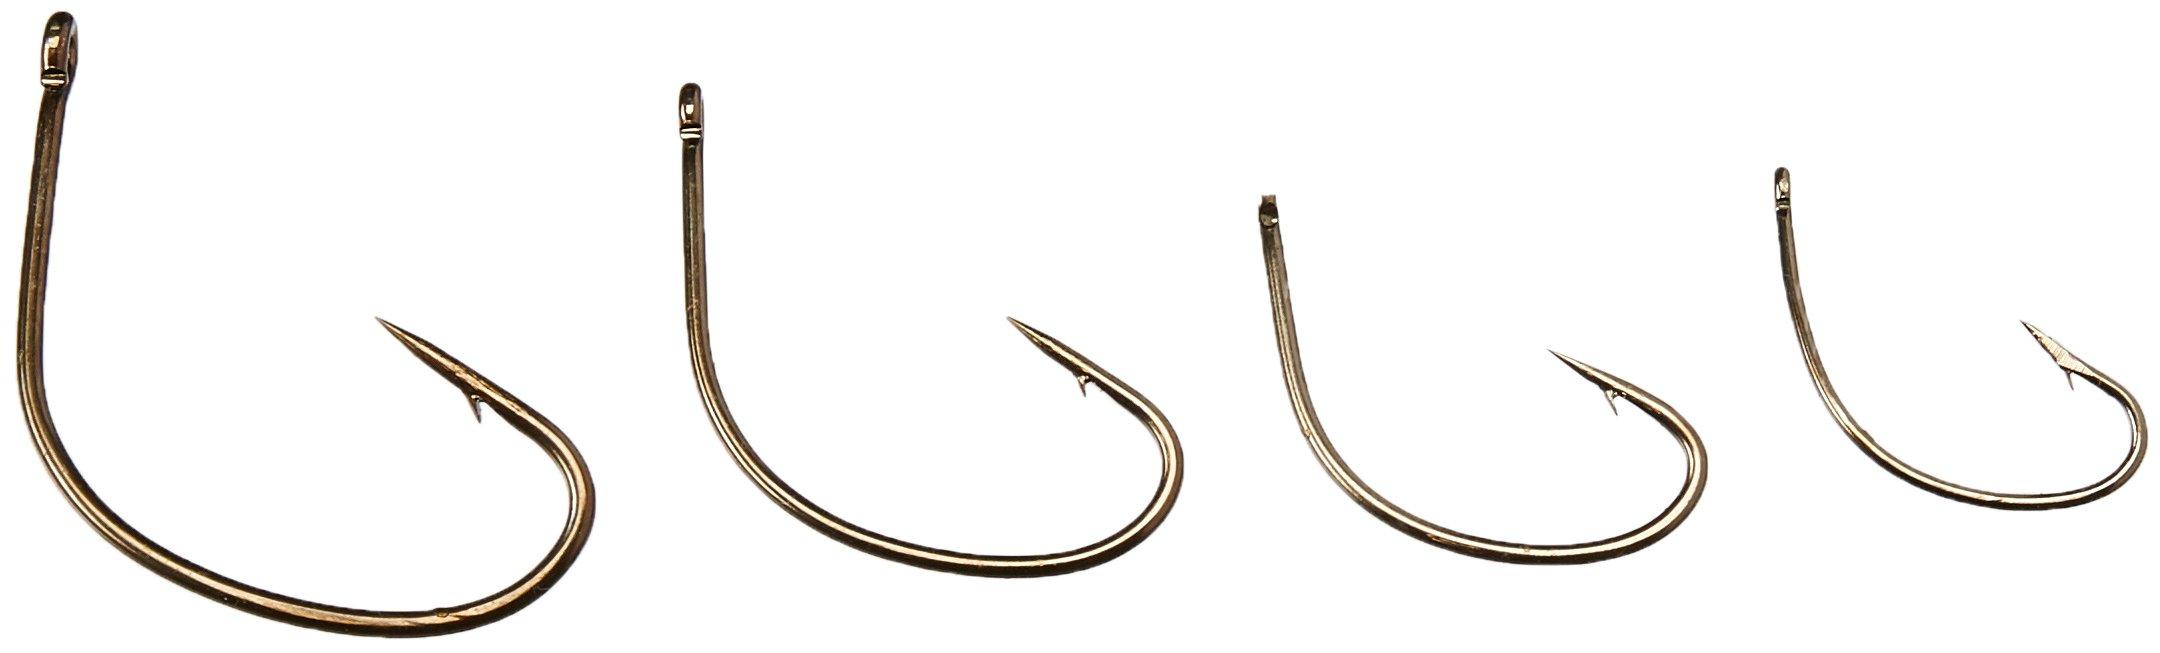 Trokar Inshore Kahle Fishing Hook